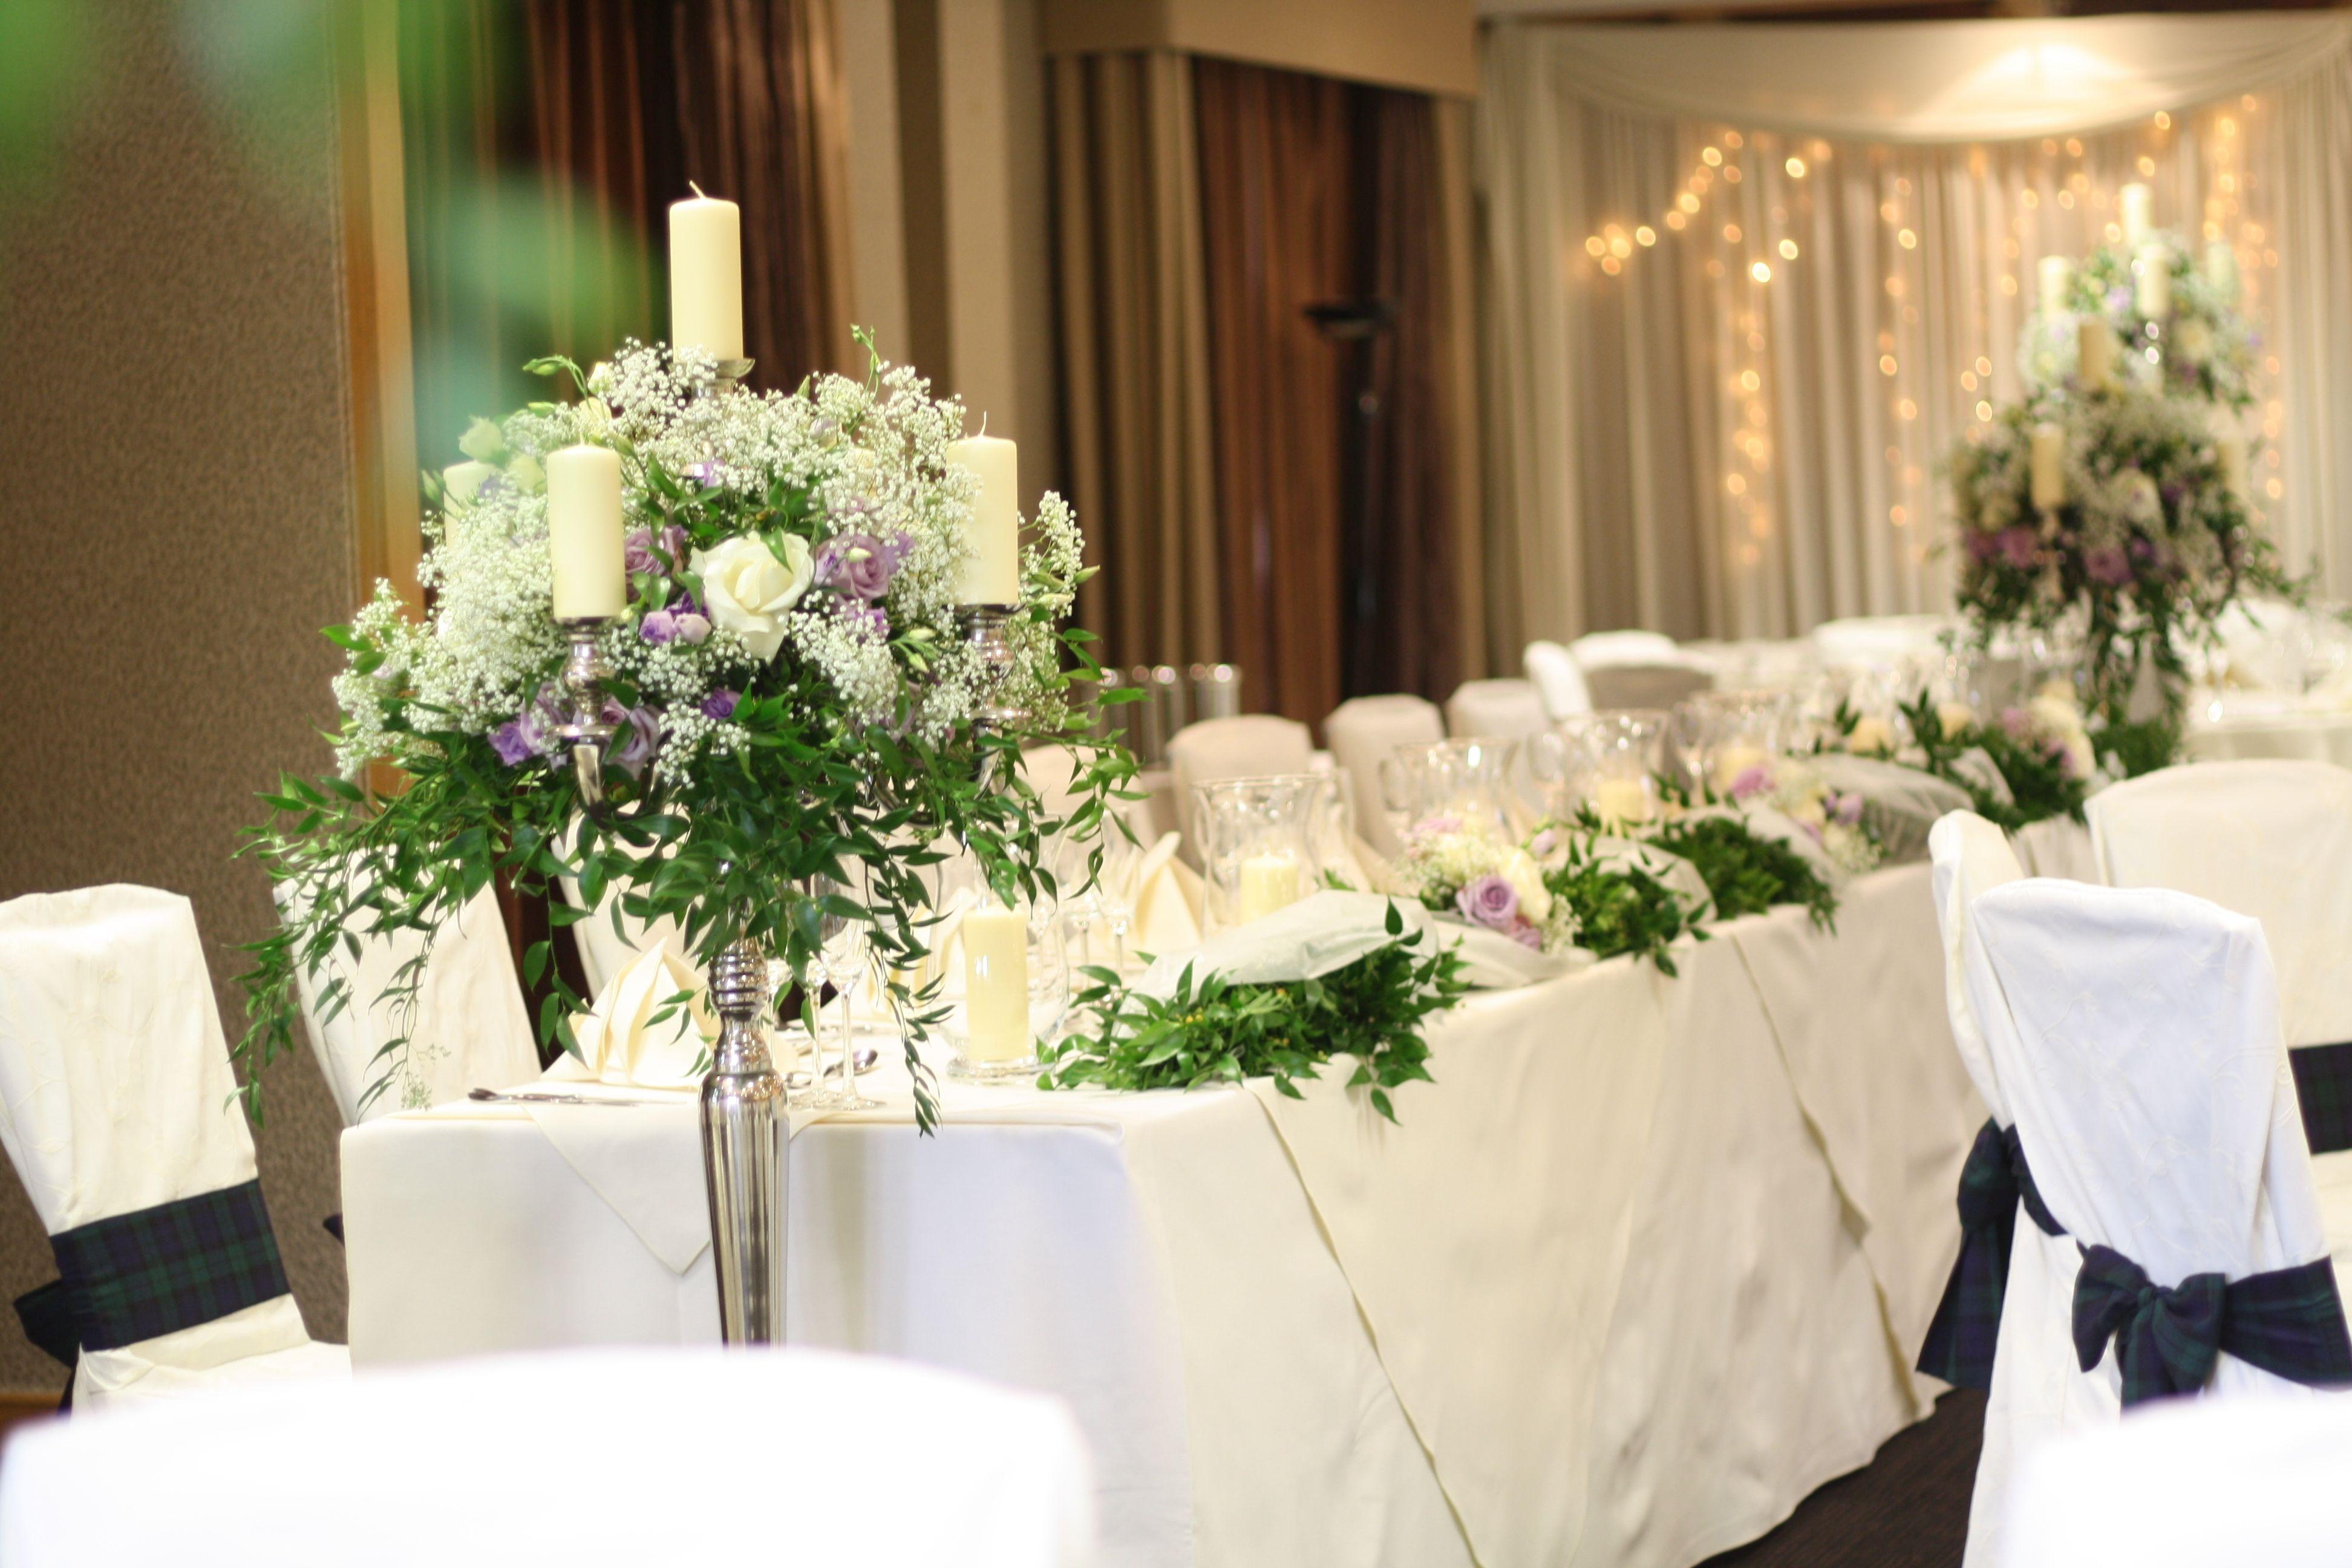 Flower Arrangements For Wedding Venue Google Search Table Decorationswedding